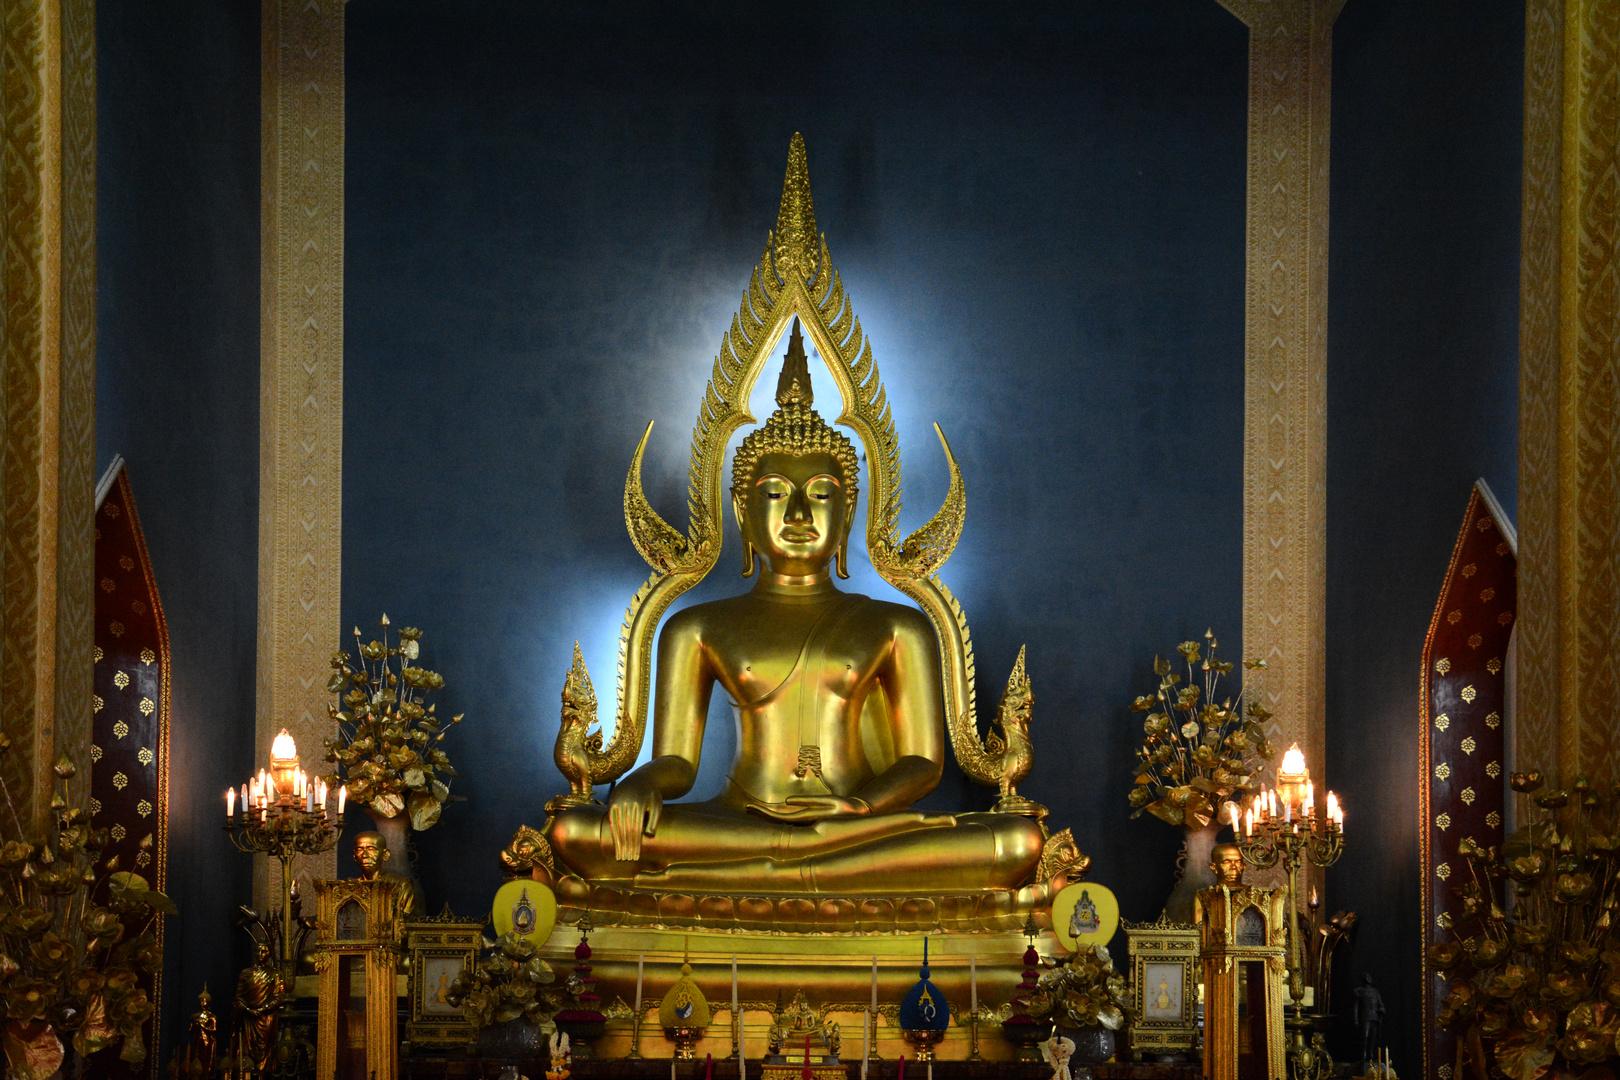 Phra Phuttha Chinnarat - Wat Benchamabophit